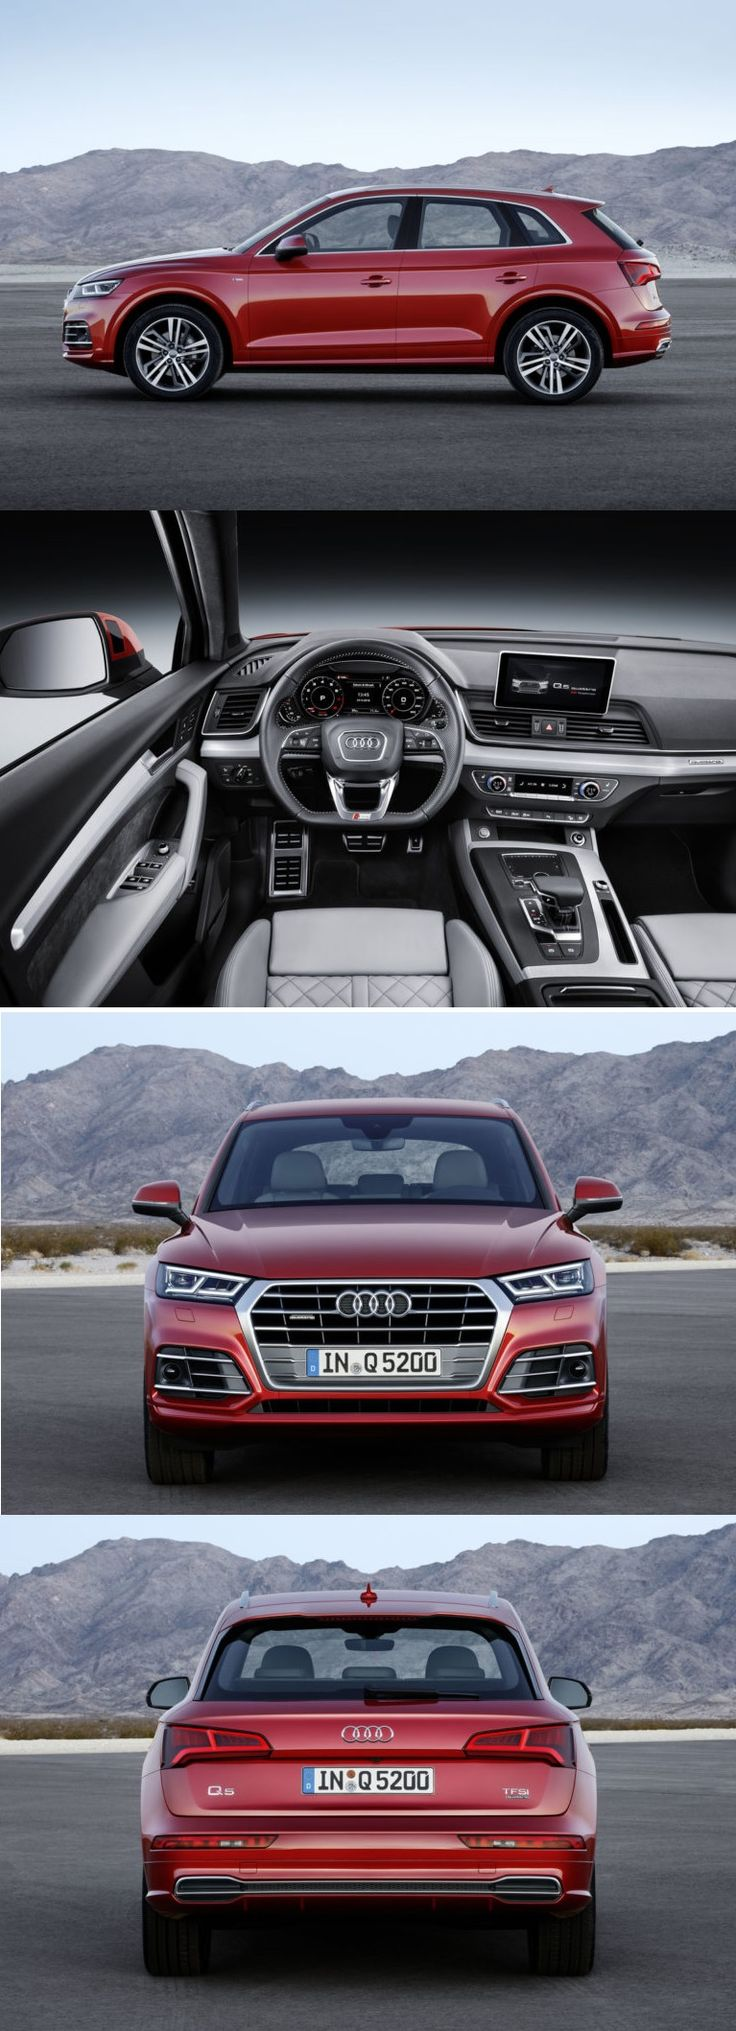 New Audi Q5 2017 SUV.